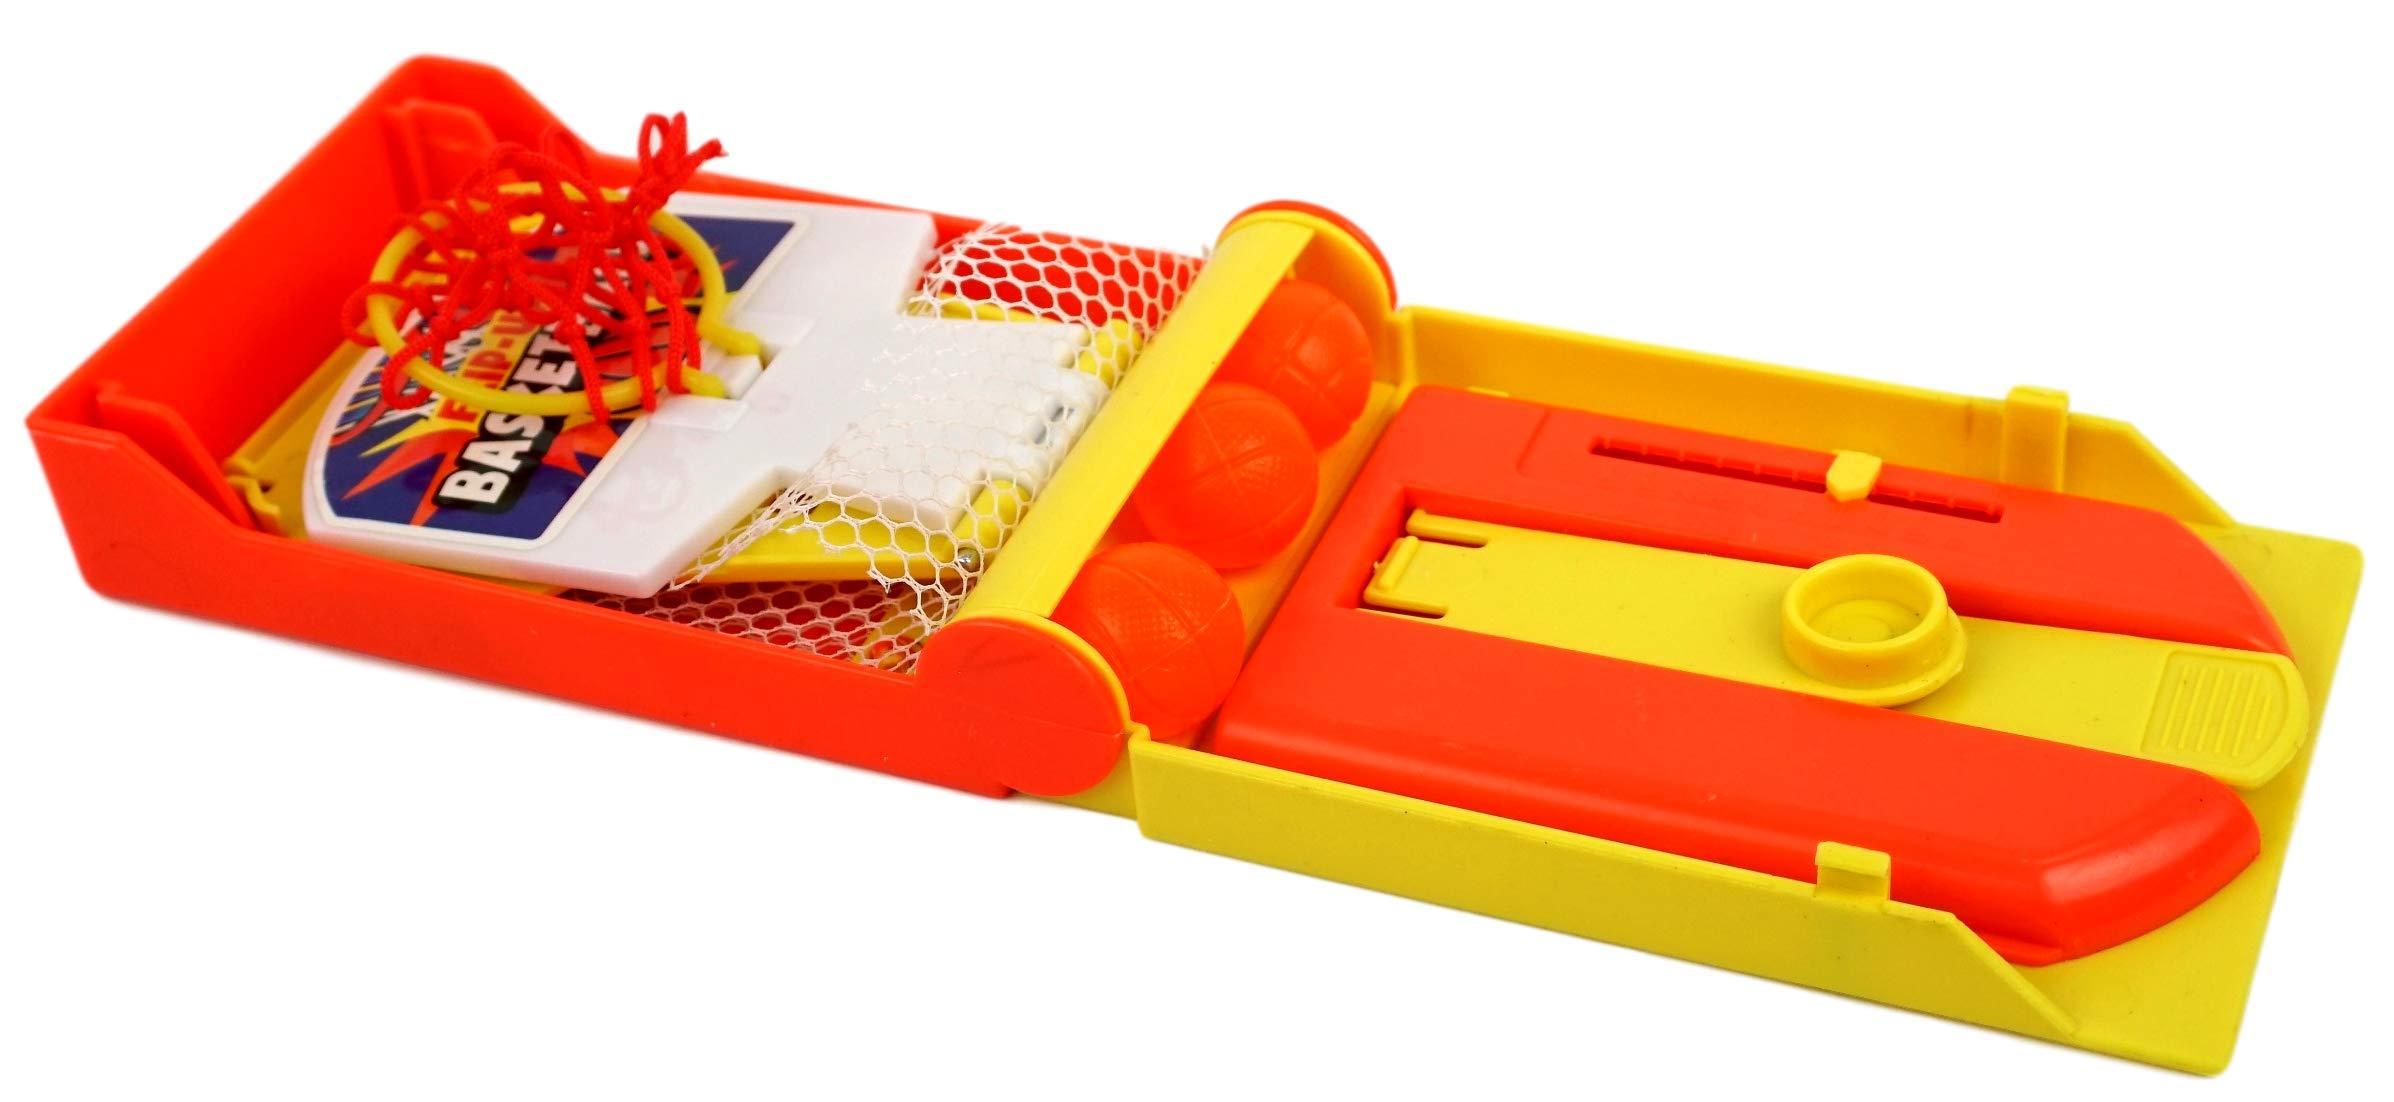 JA-RU Basketball Pocket Travel Game (144 Units) and one Bouncy Ball Item #3255-144p by JA-RU (Image #4)